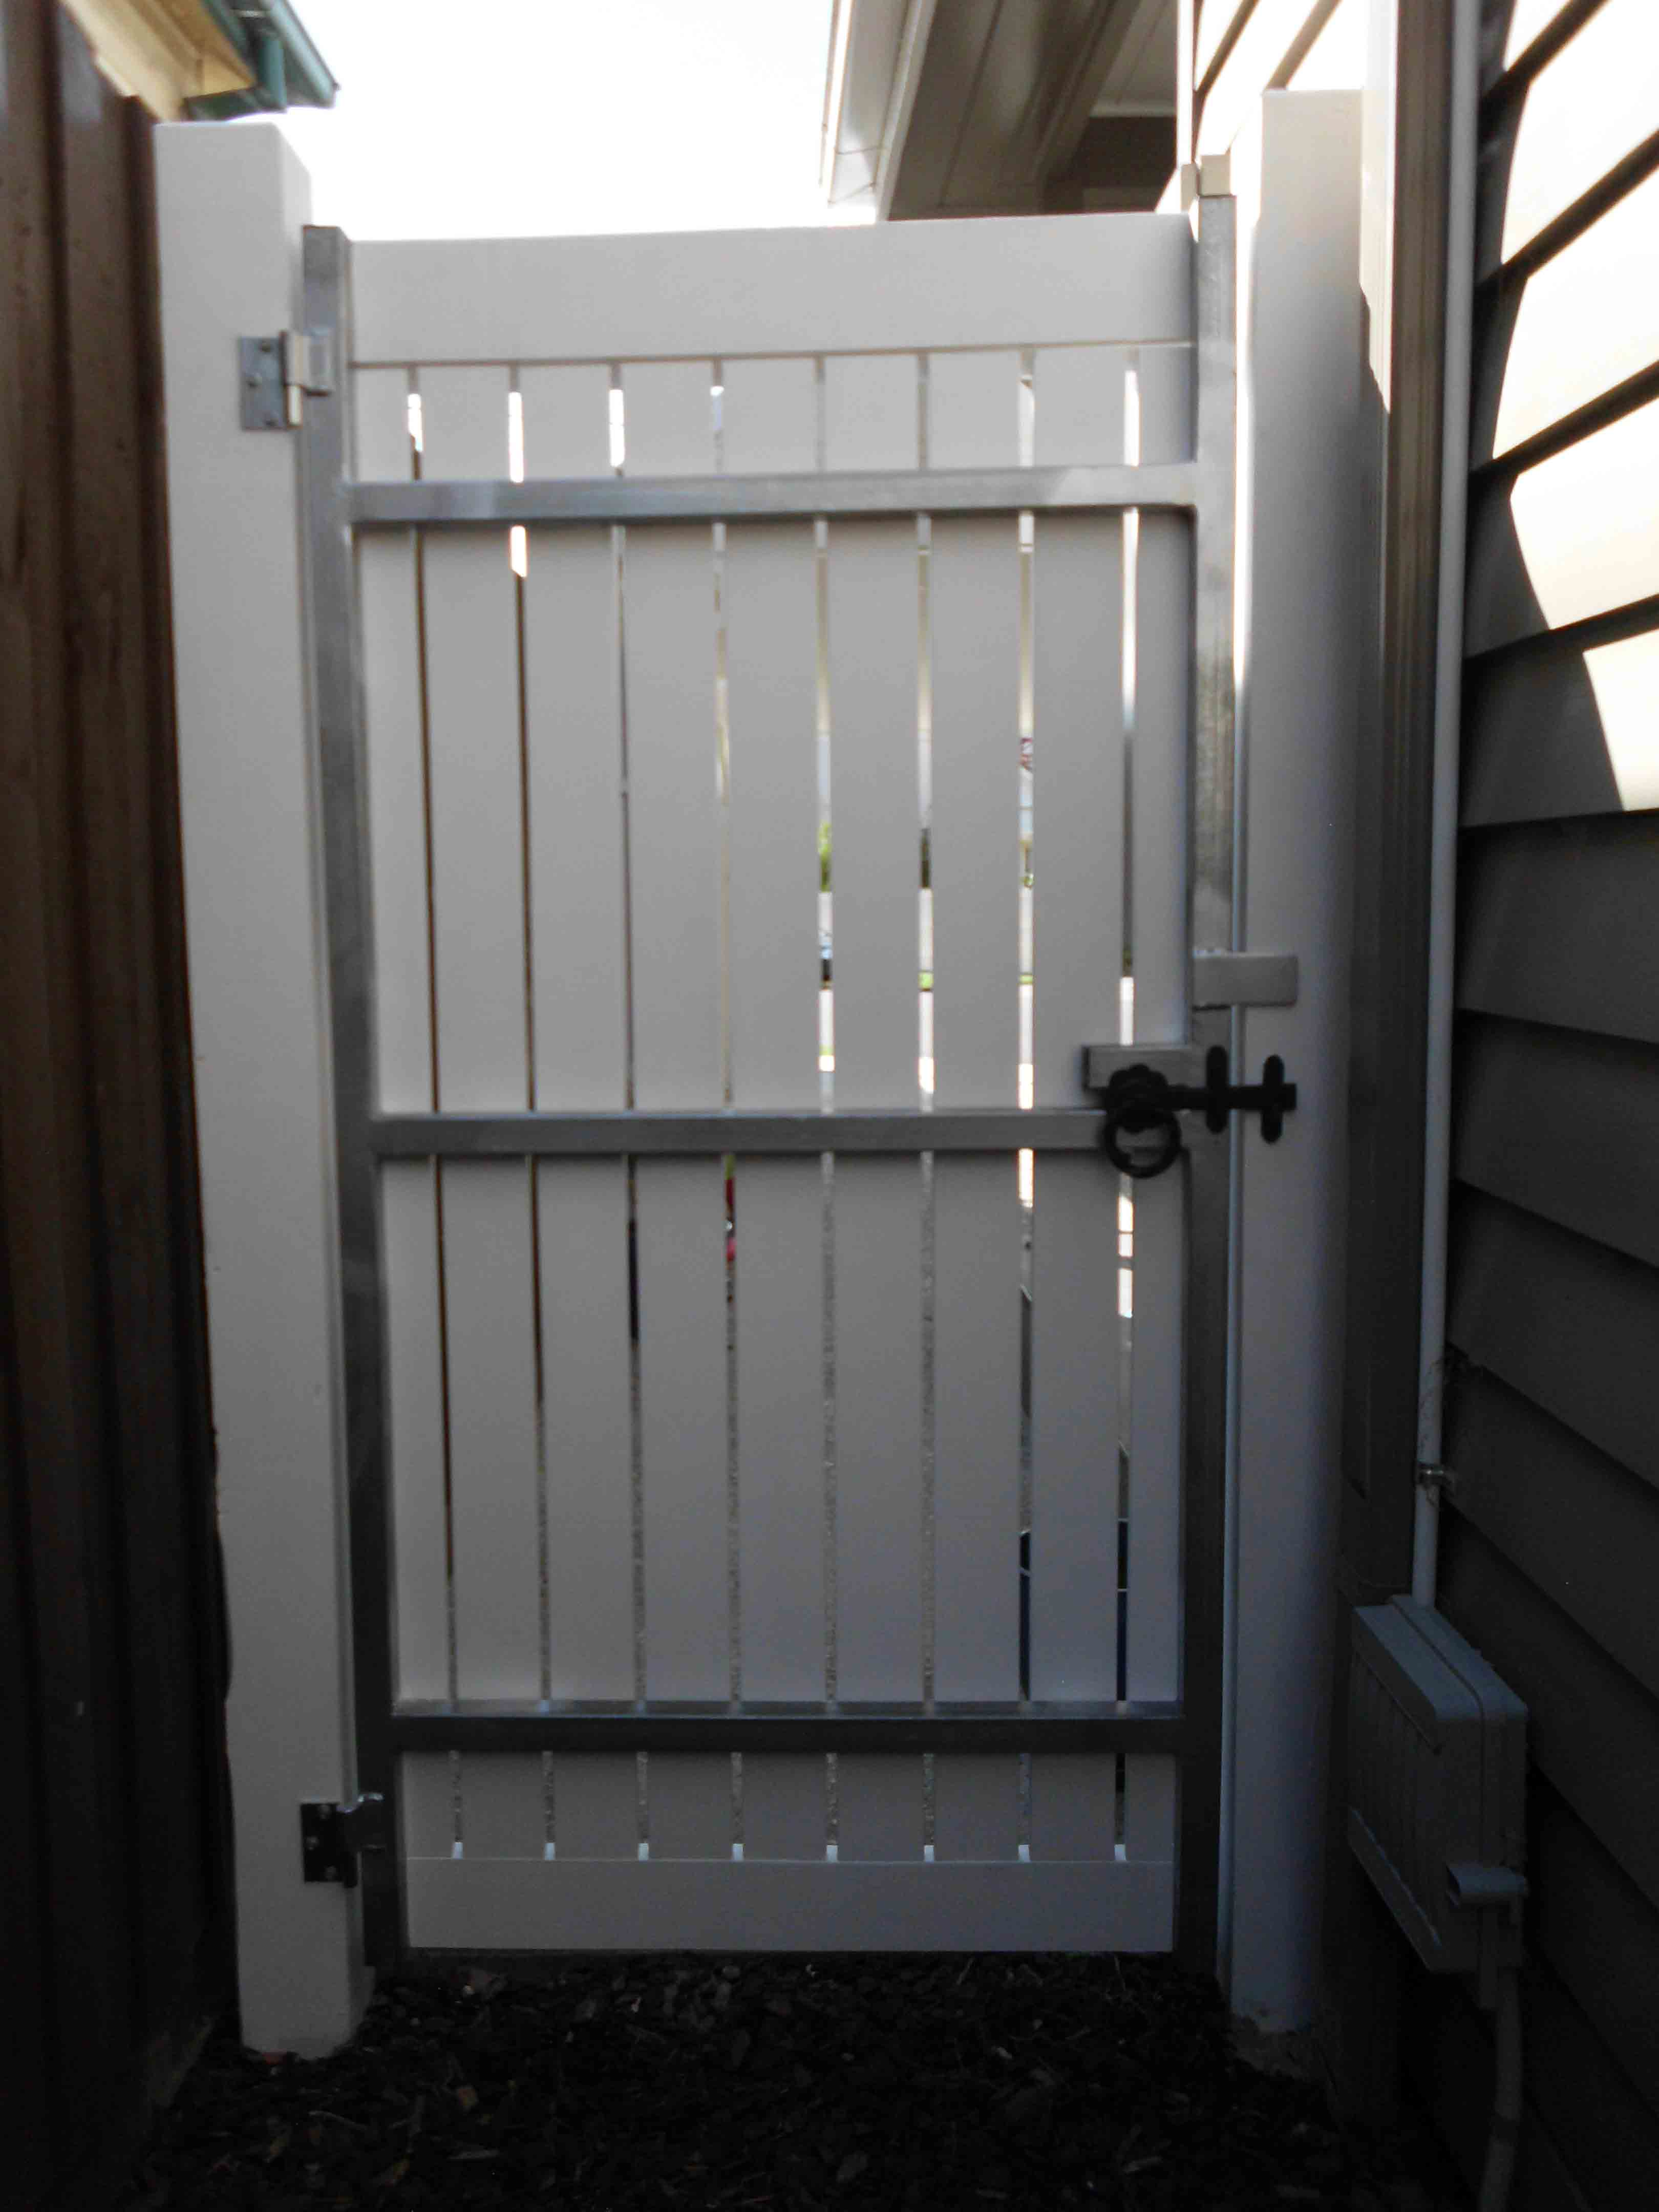 Matthews Fences And Gates Garden Gates And Fences For